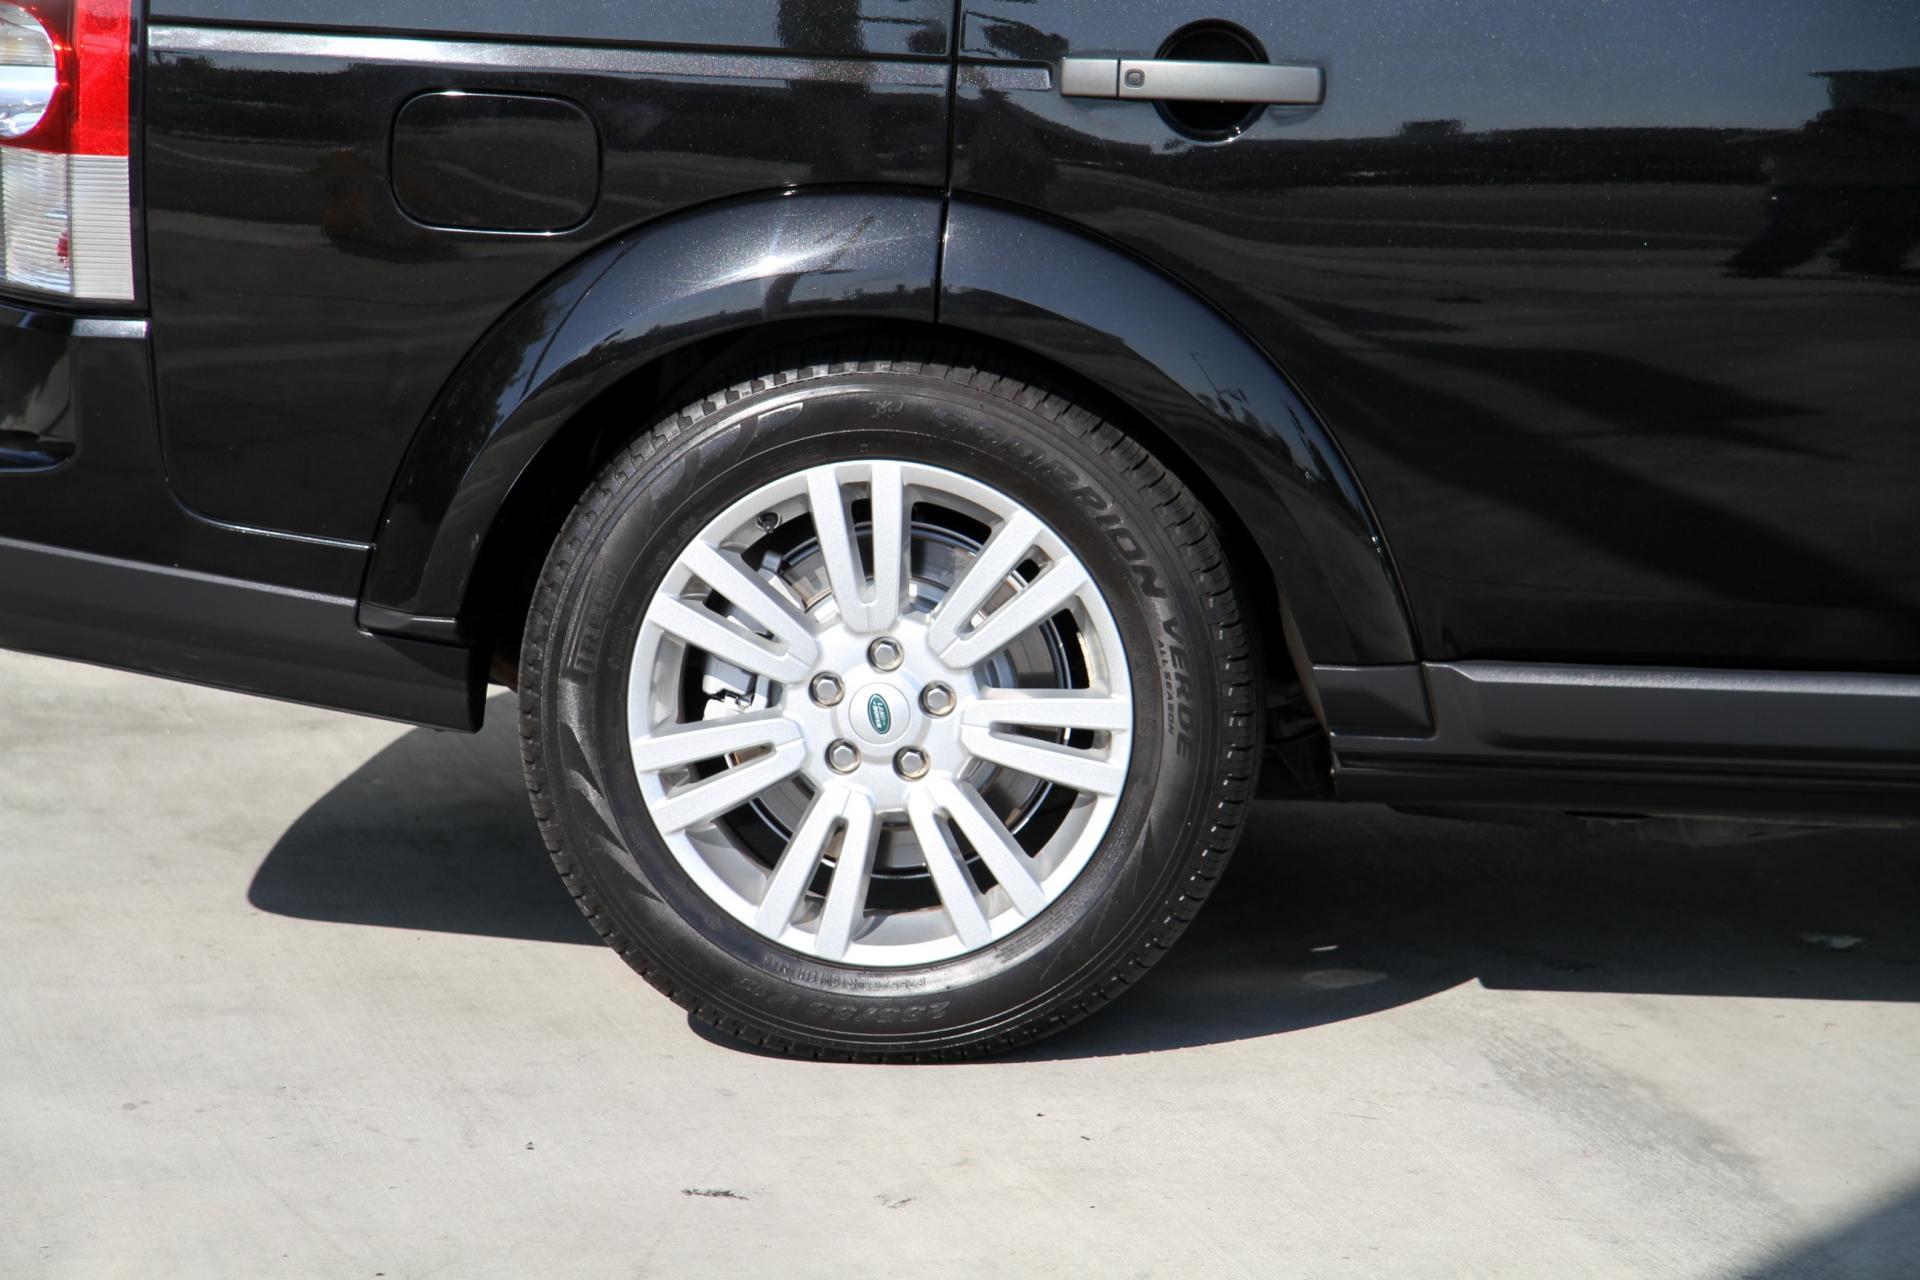 2012 Land Rover LR4 HSE Stock 5989 for sale near Redondo Beach